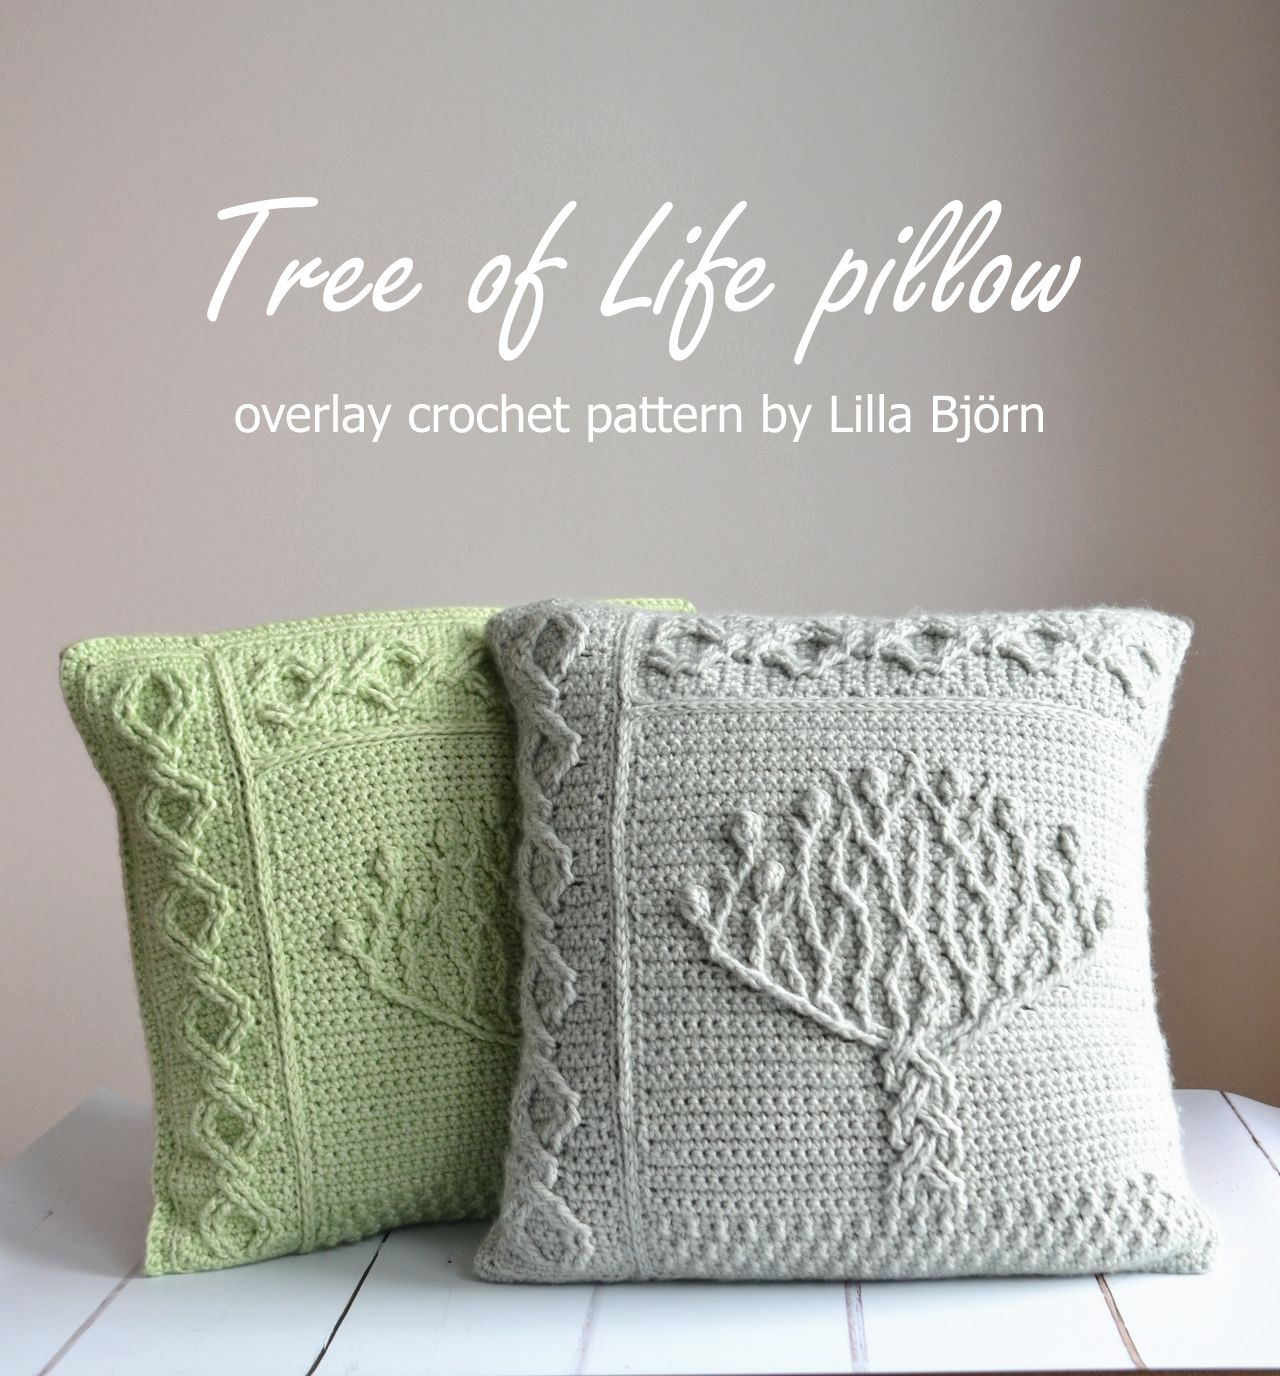 Tree Of Life Pillow New Overlay Crochet Pattern